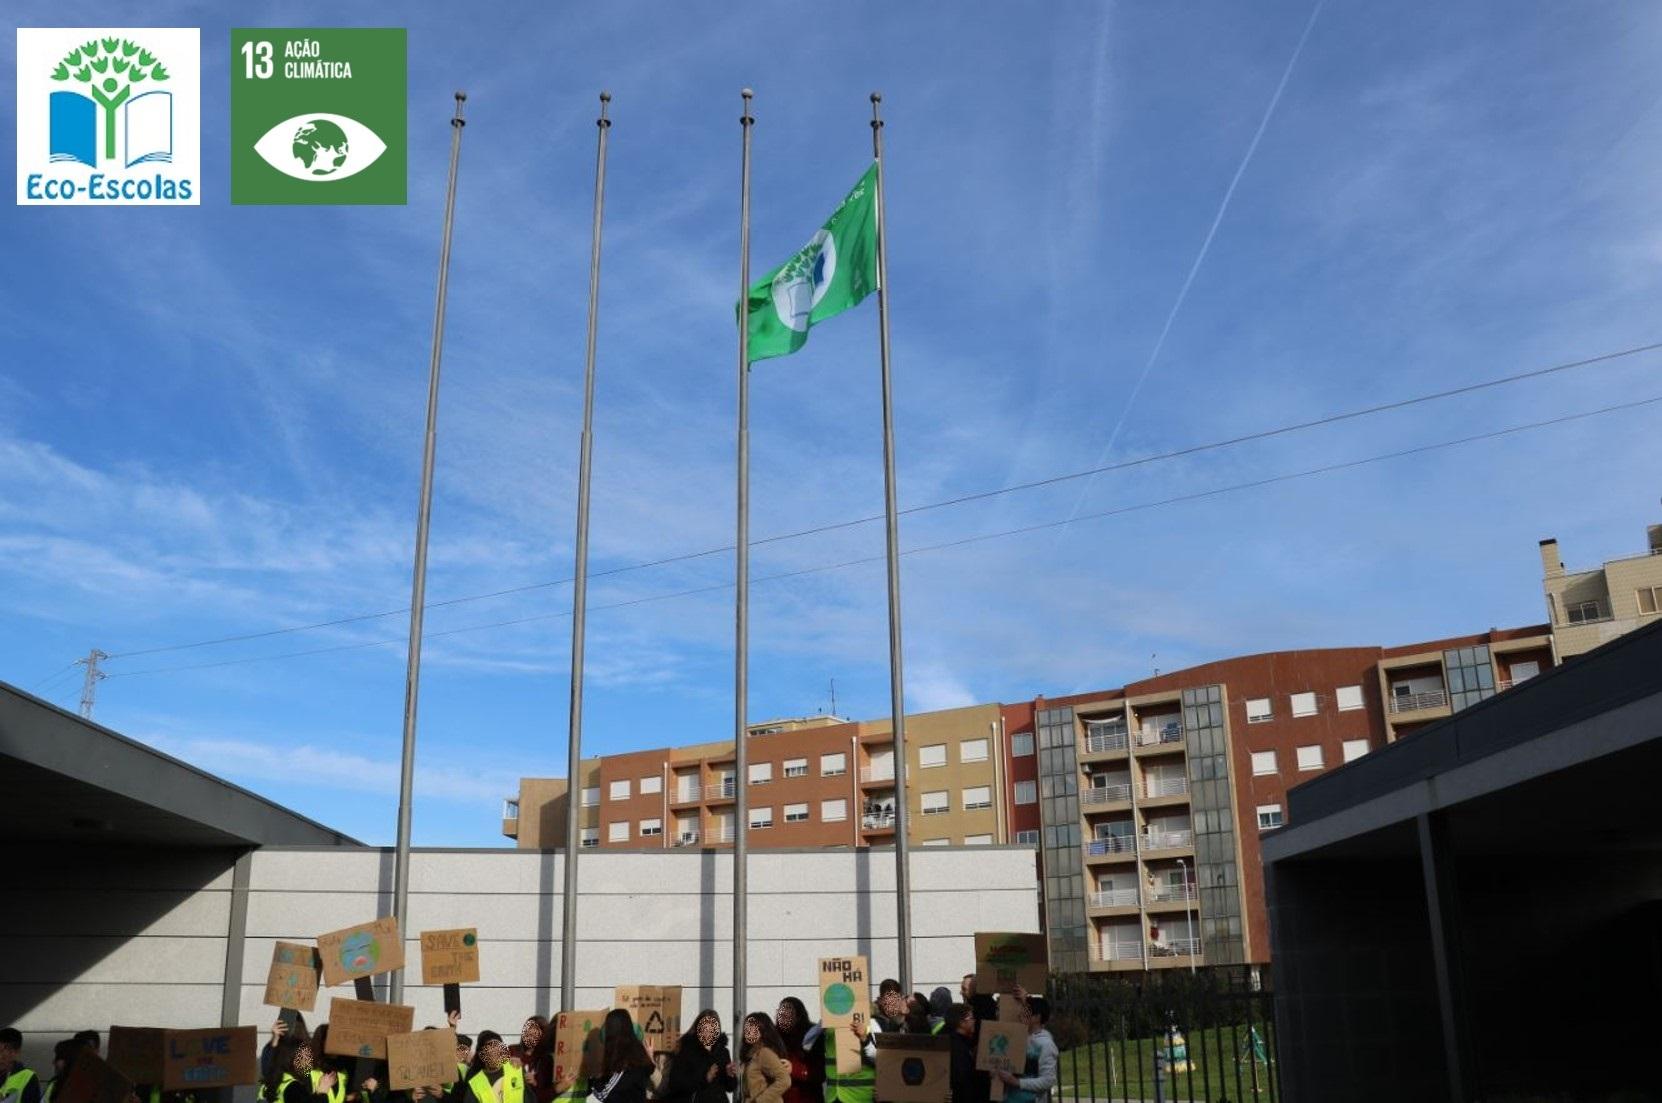 O hastear da segunda Bandeira Verde da Escola Básica e Secundária de Canelas